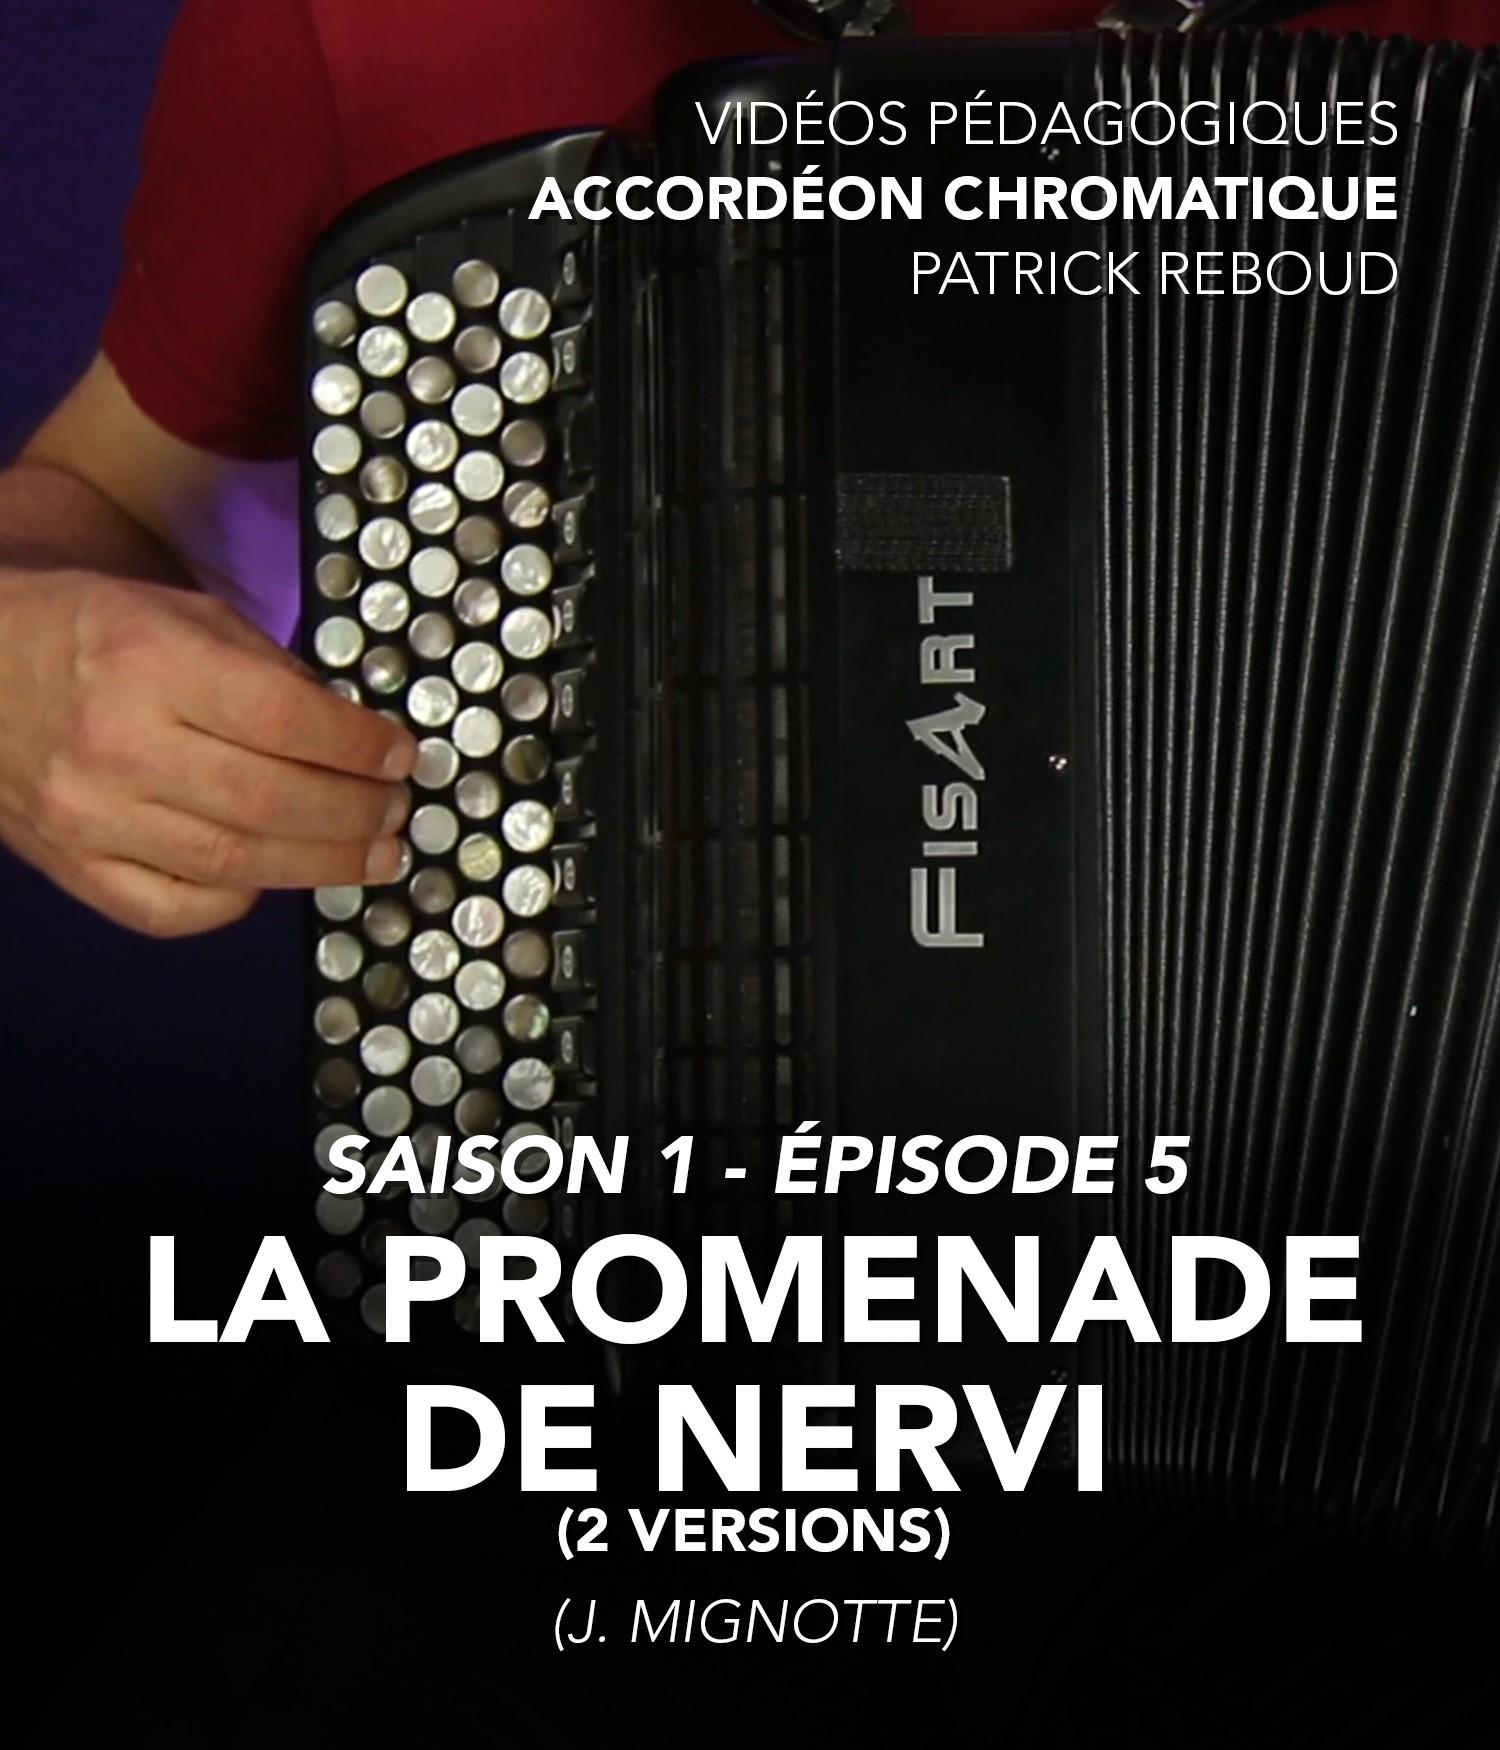 Online teaching videos - Chromatic accordion - Patrick Reboud